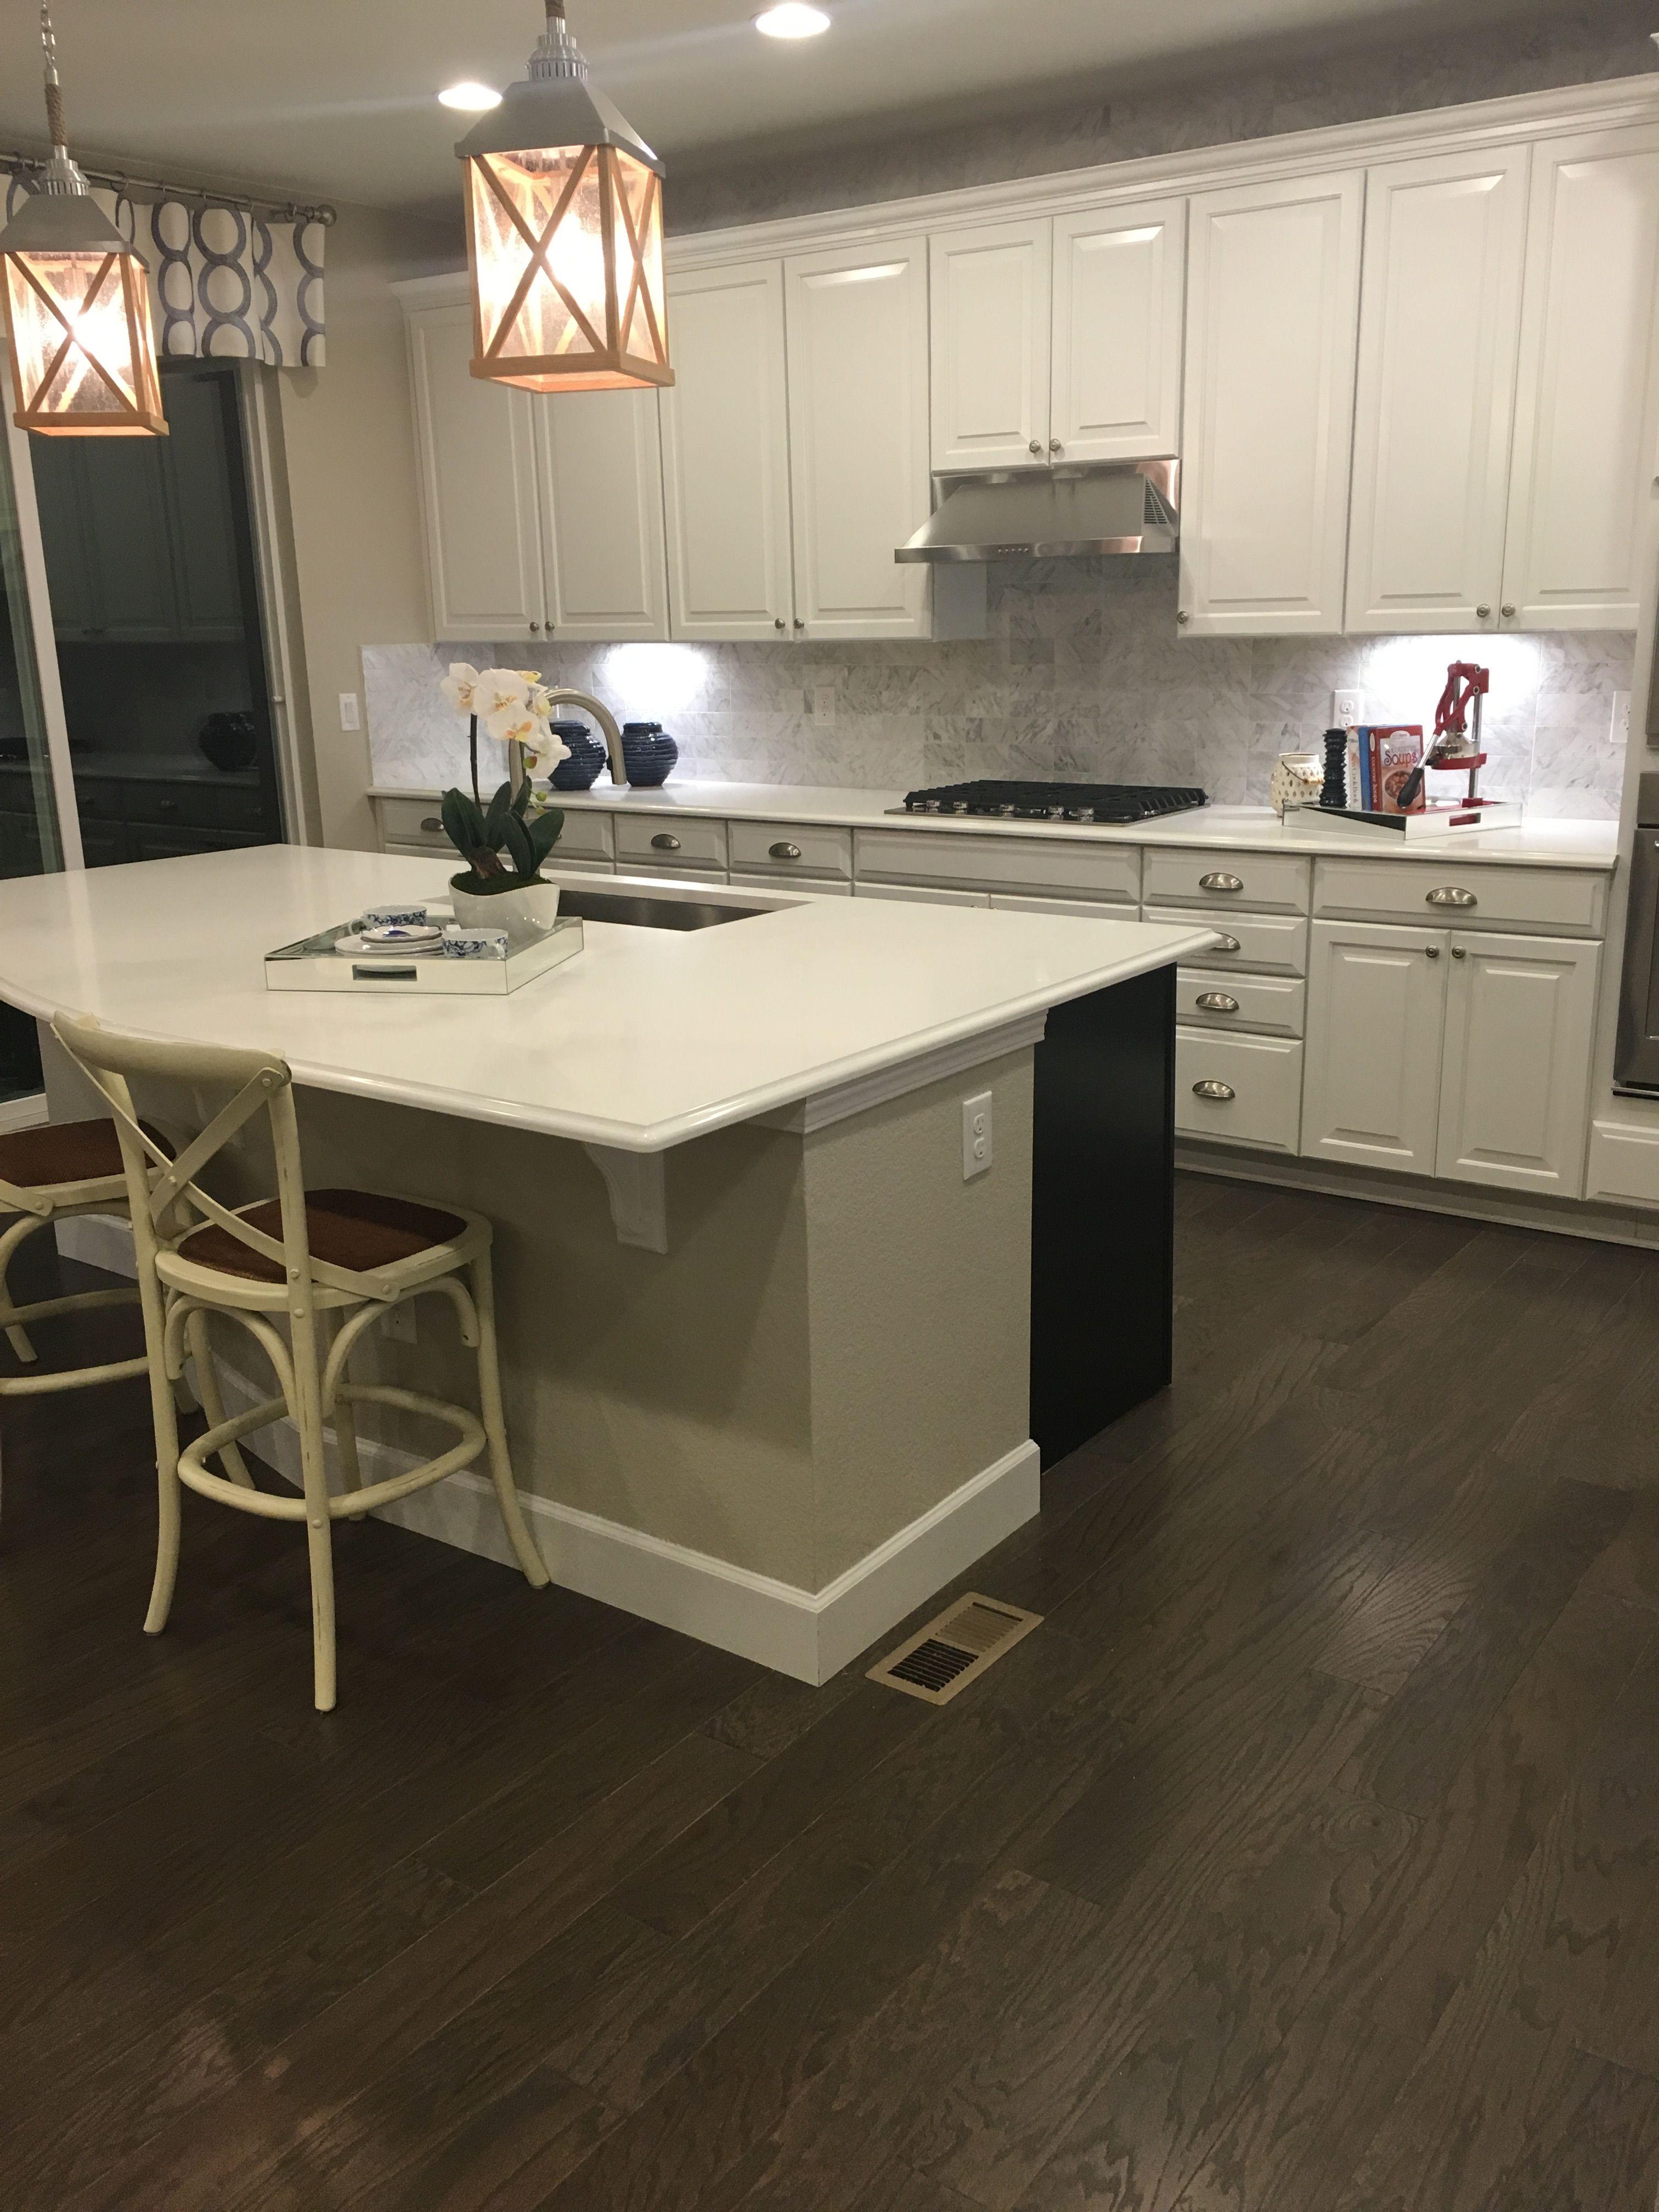 Best Timberlake Rushmore Linen Cabinets White Quartz Ctop 400 x 300